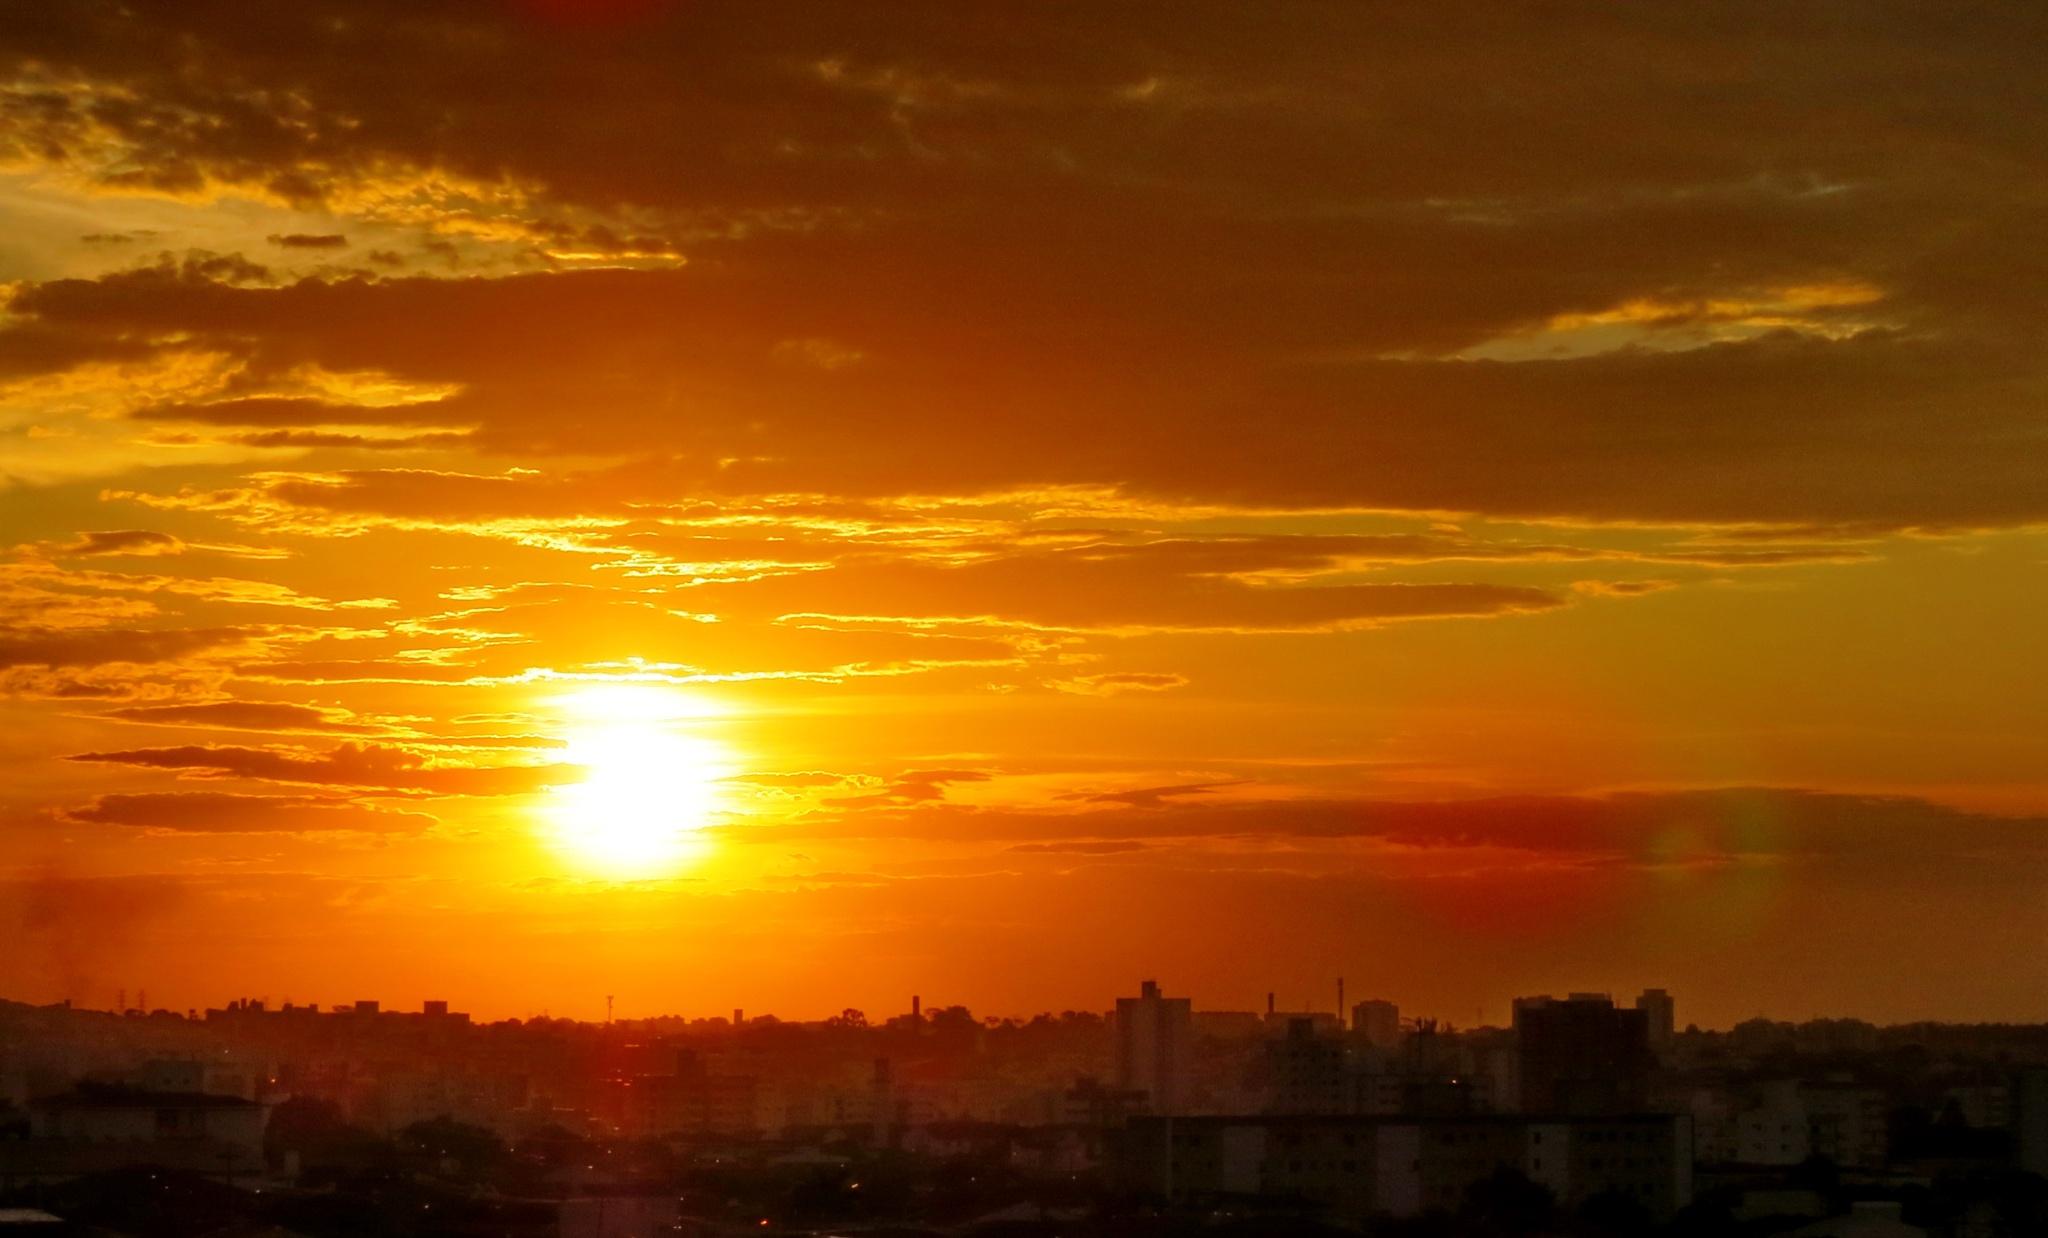 Another sundown by Nestor